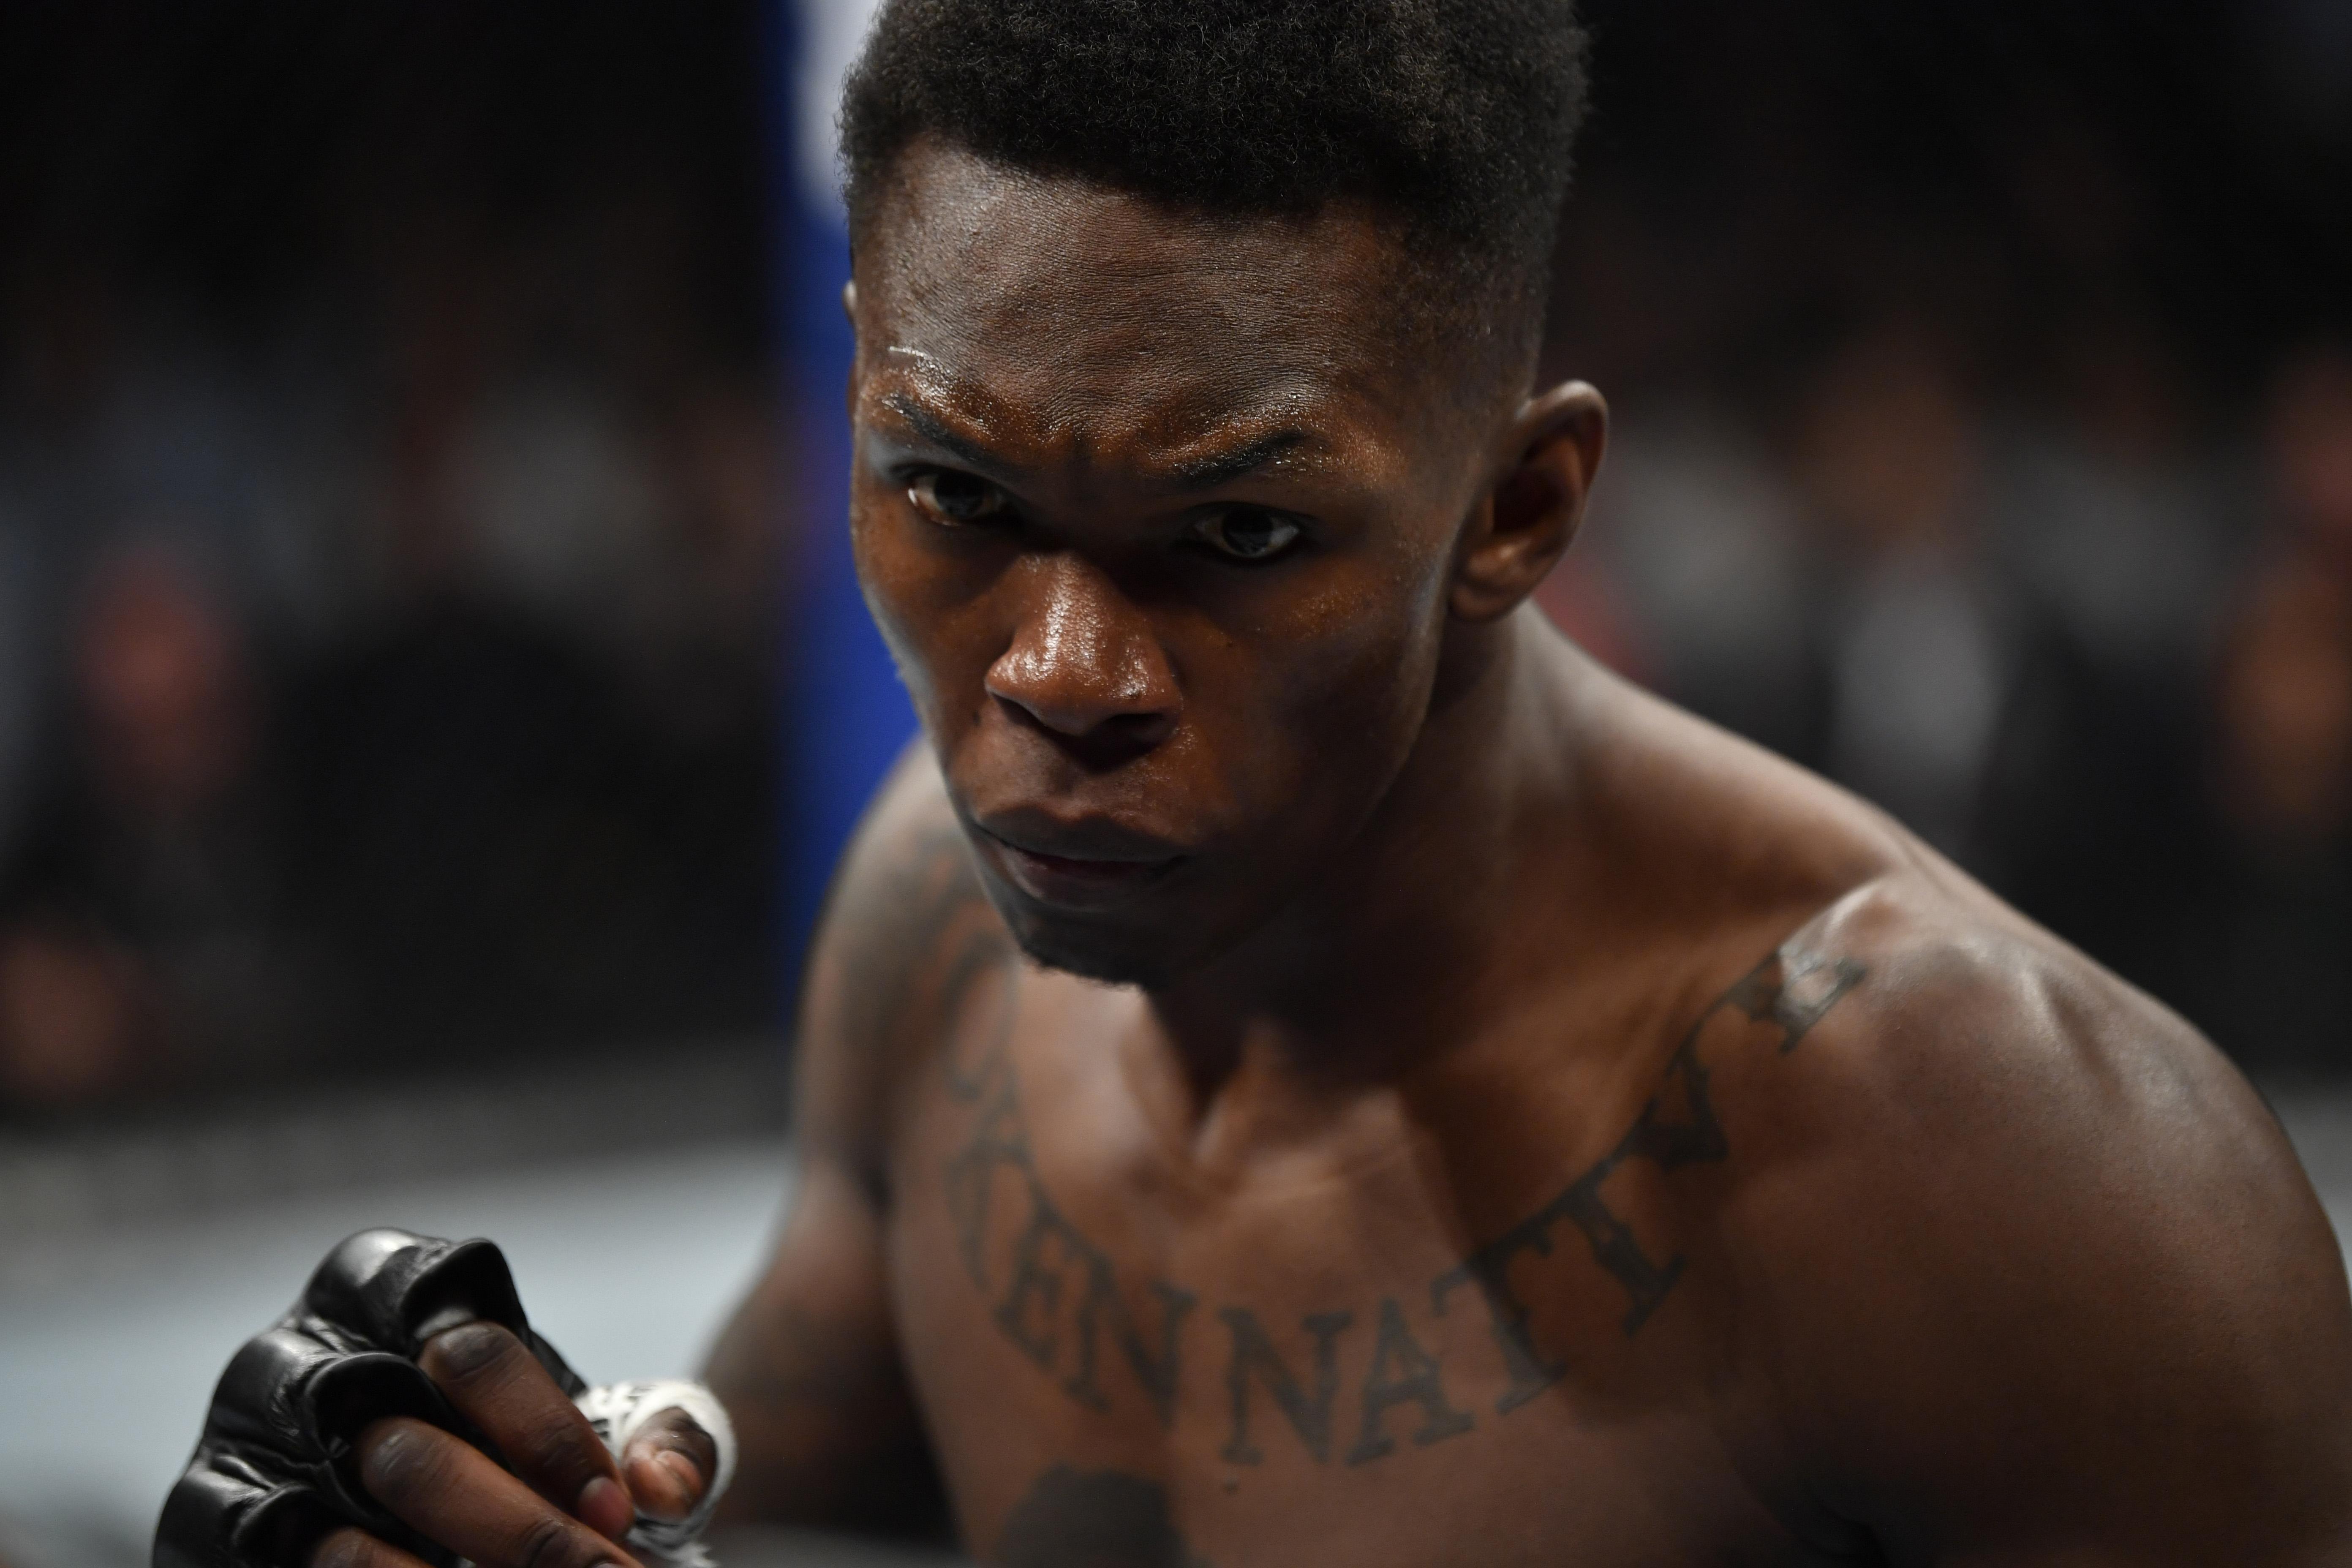 Israel Adesanya battles Yoel Romero in their UFC middleweight championship fight